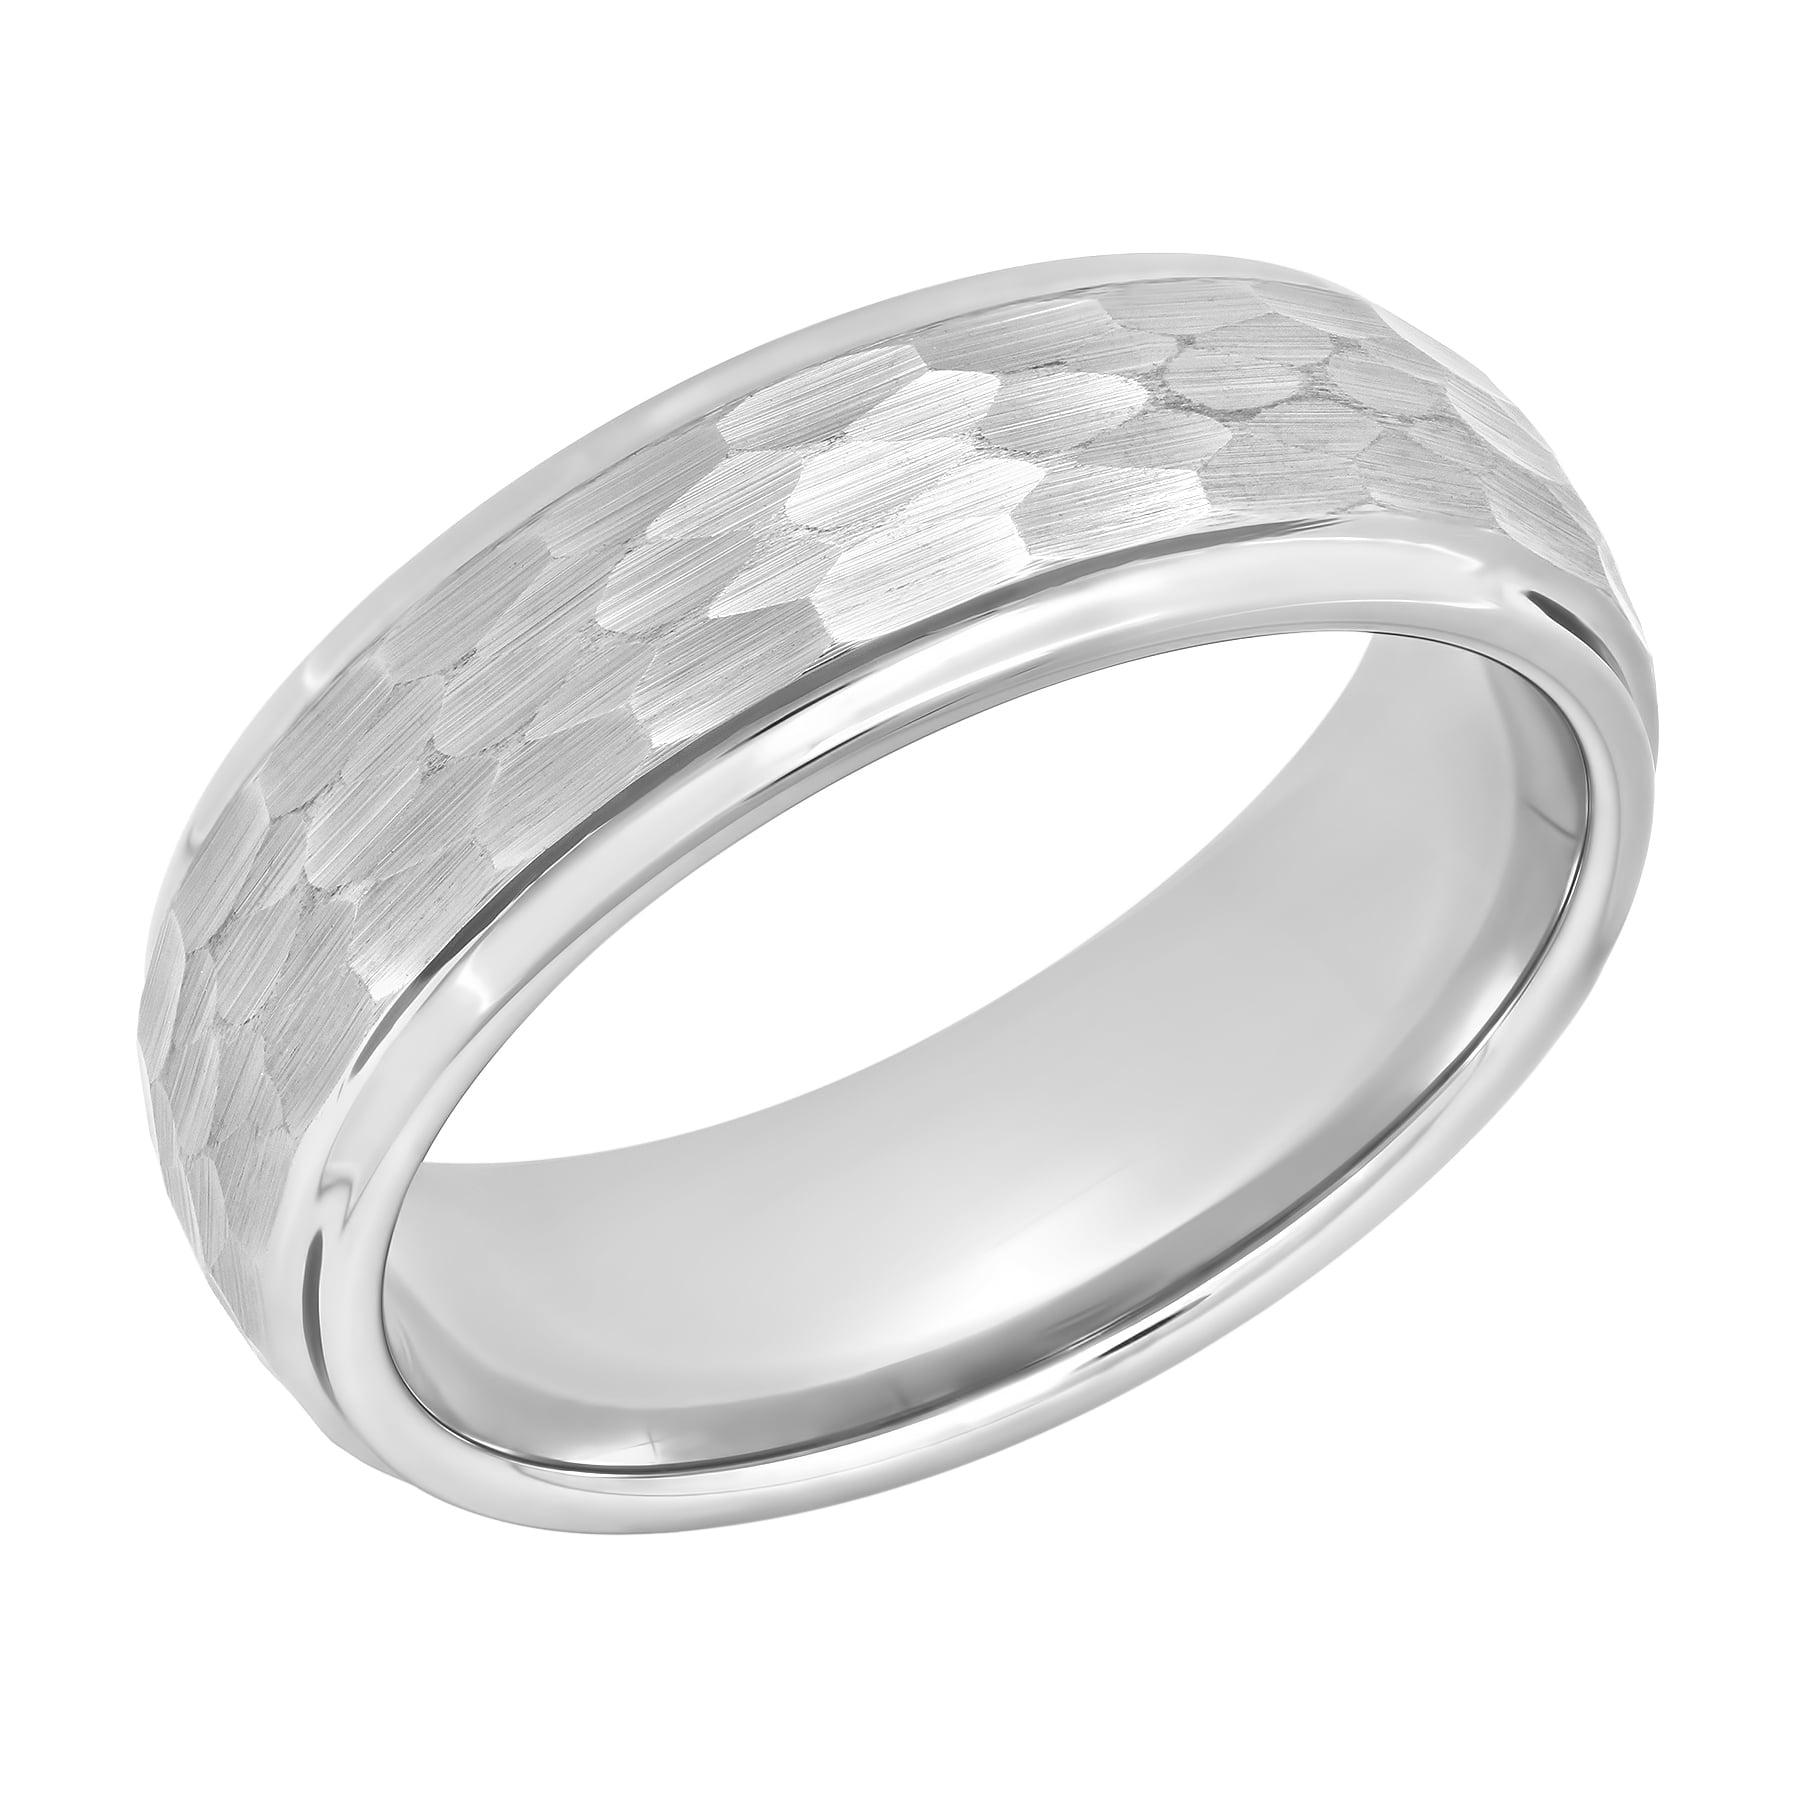 Men's Tungsten 8mm Hammered Finish Wedding Band  Mens Ring  Walmart